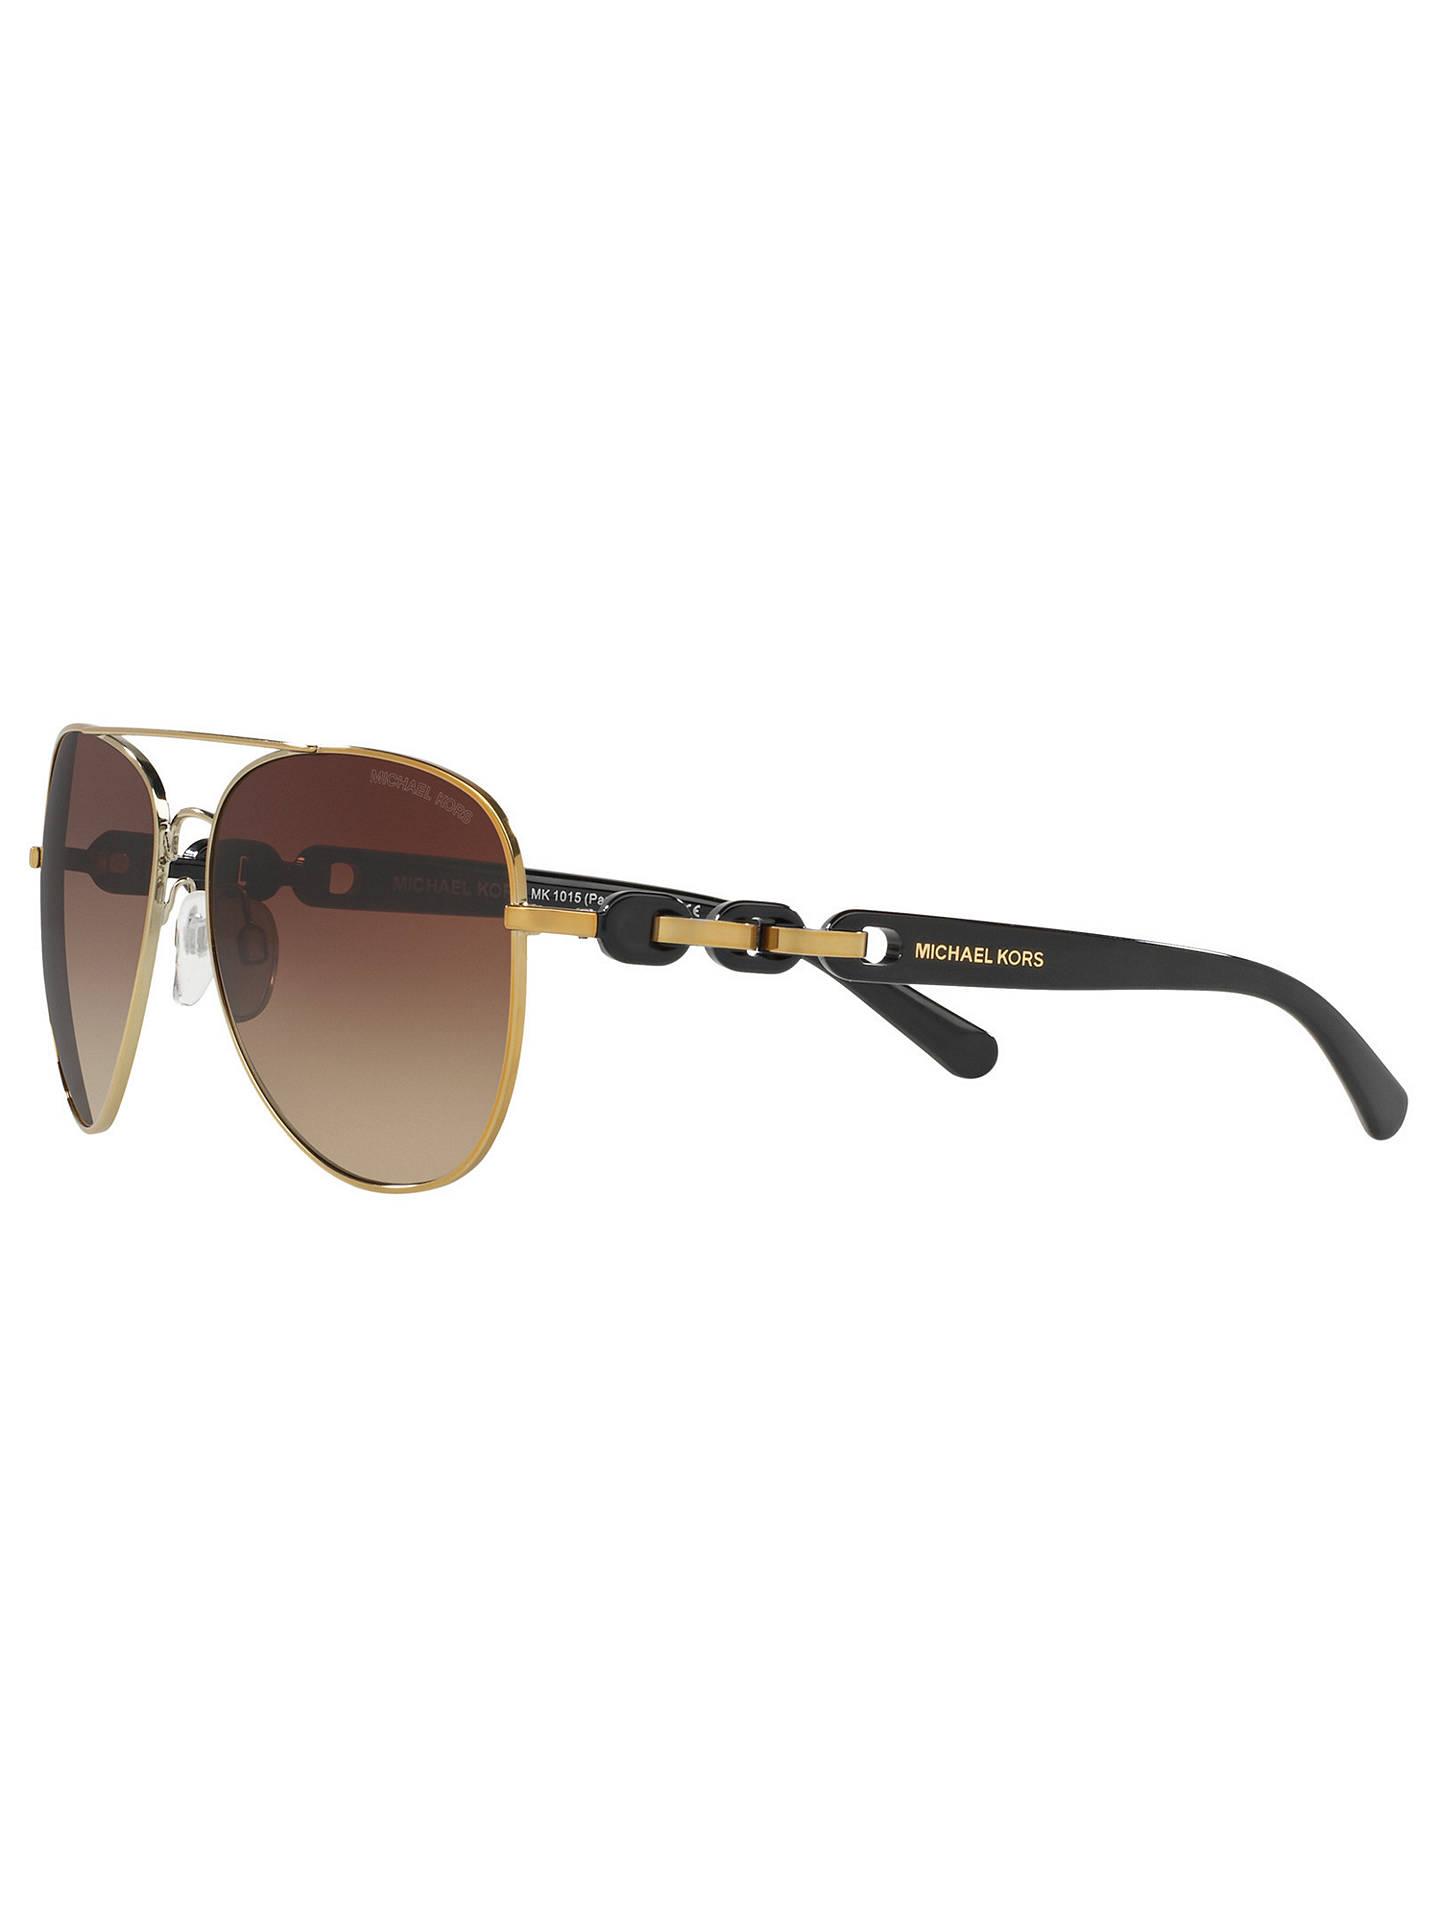 fe54caa37a2 Michael Kors MK1015 Pandora I Aviator Sunglasses at John Lewis ...